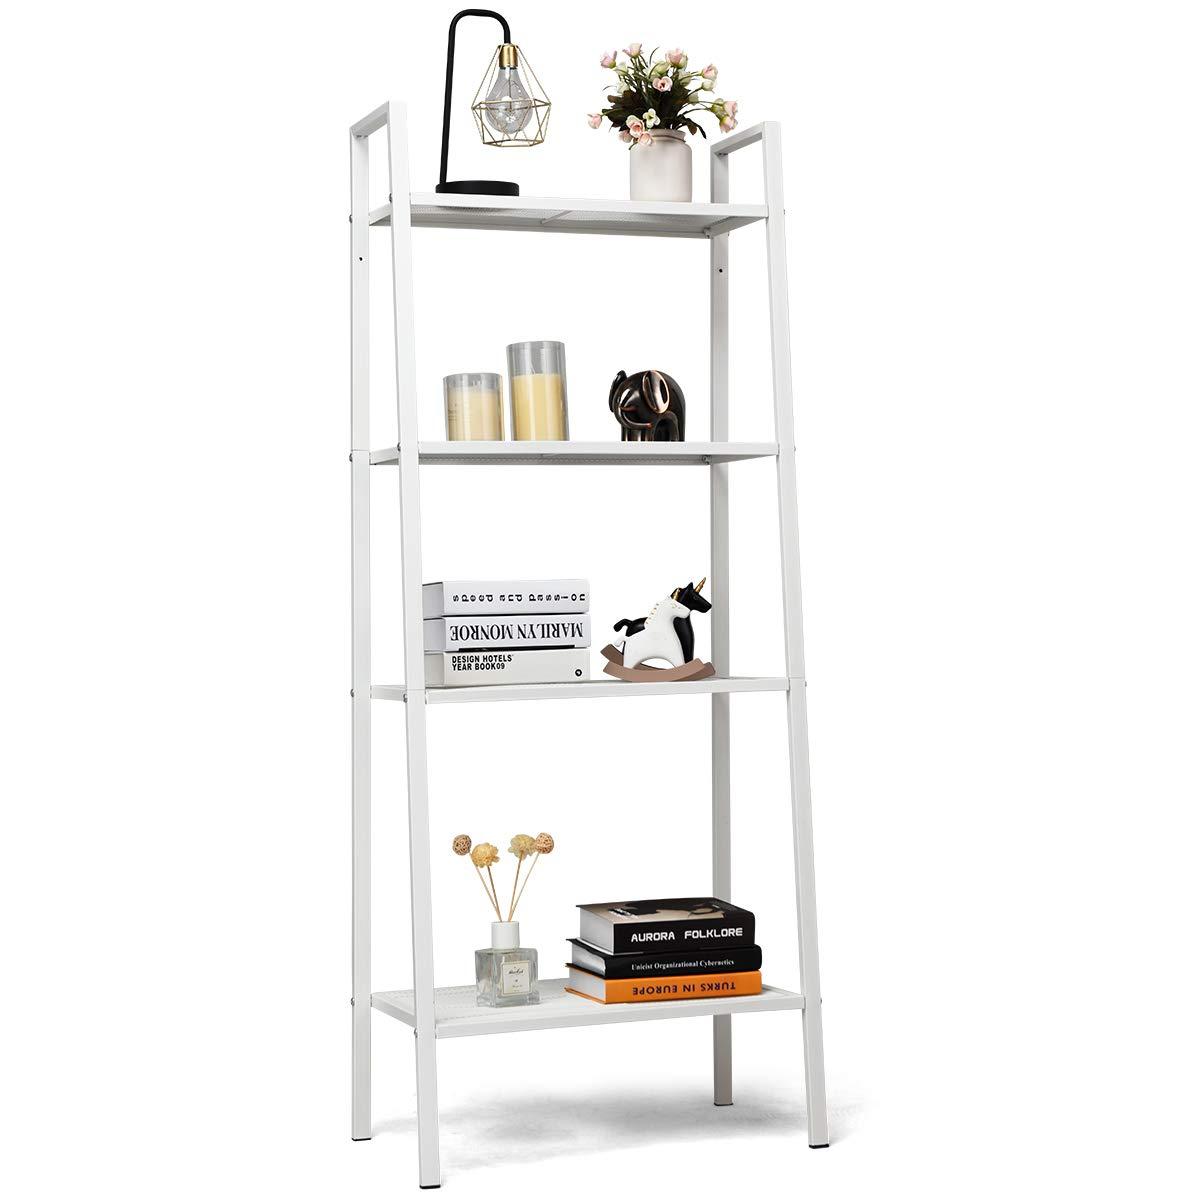 Tangkula 4-Tier Metal Ladder Shelf, Multifunctional Storage Rack, Bookshelf with Metal Mesh Layers, Display Stand Furniture Storage Shelves, Flower Rack Plant Stand (White) by Tangkula